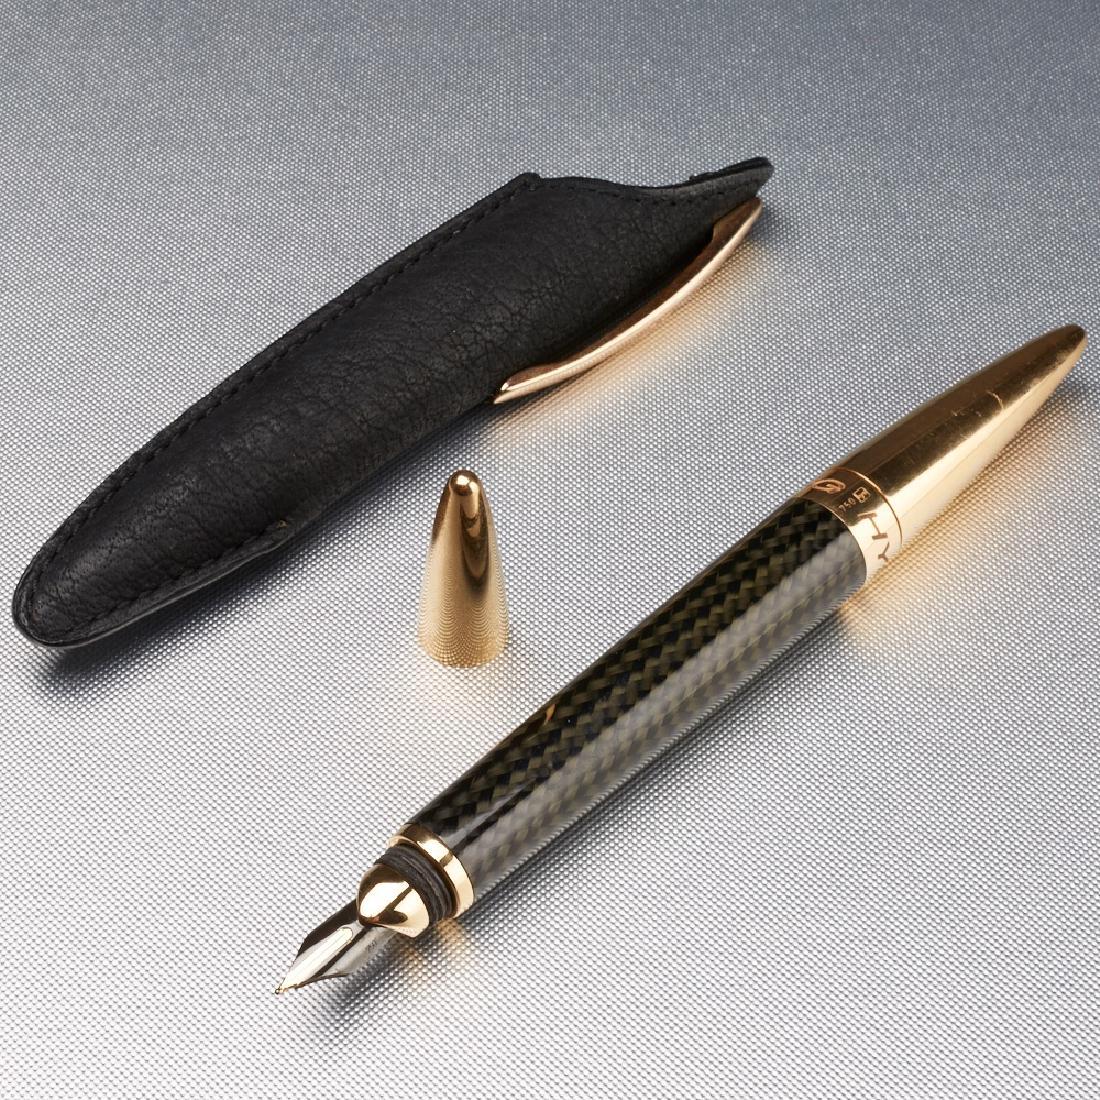 Jorg Hysek Carbon Fiber And Gold Fountain Pen